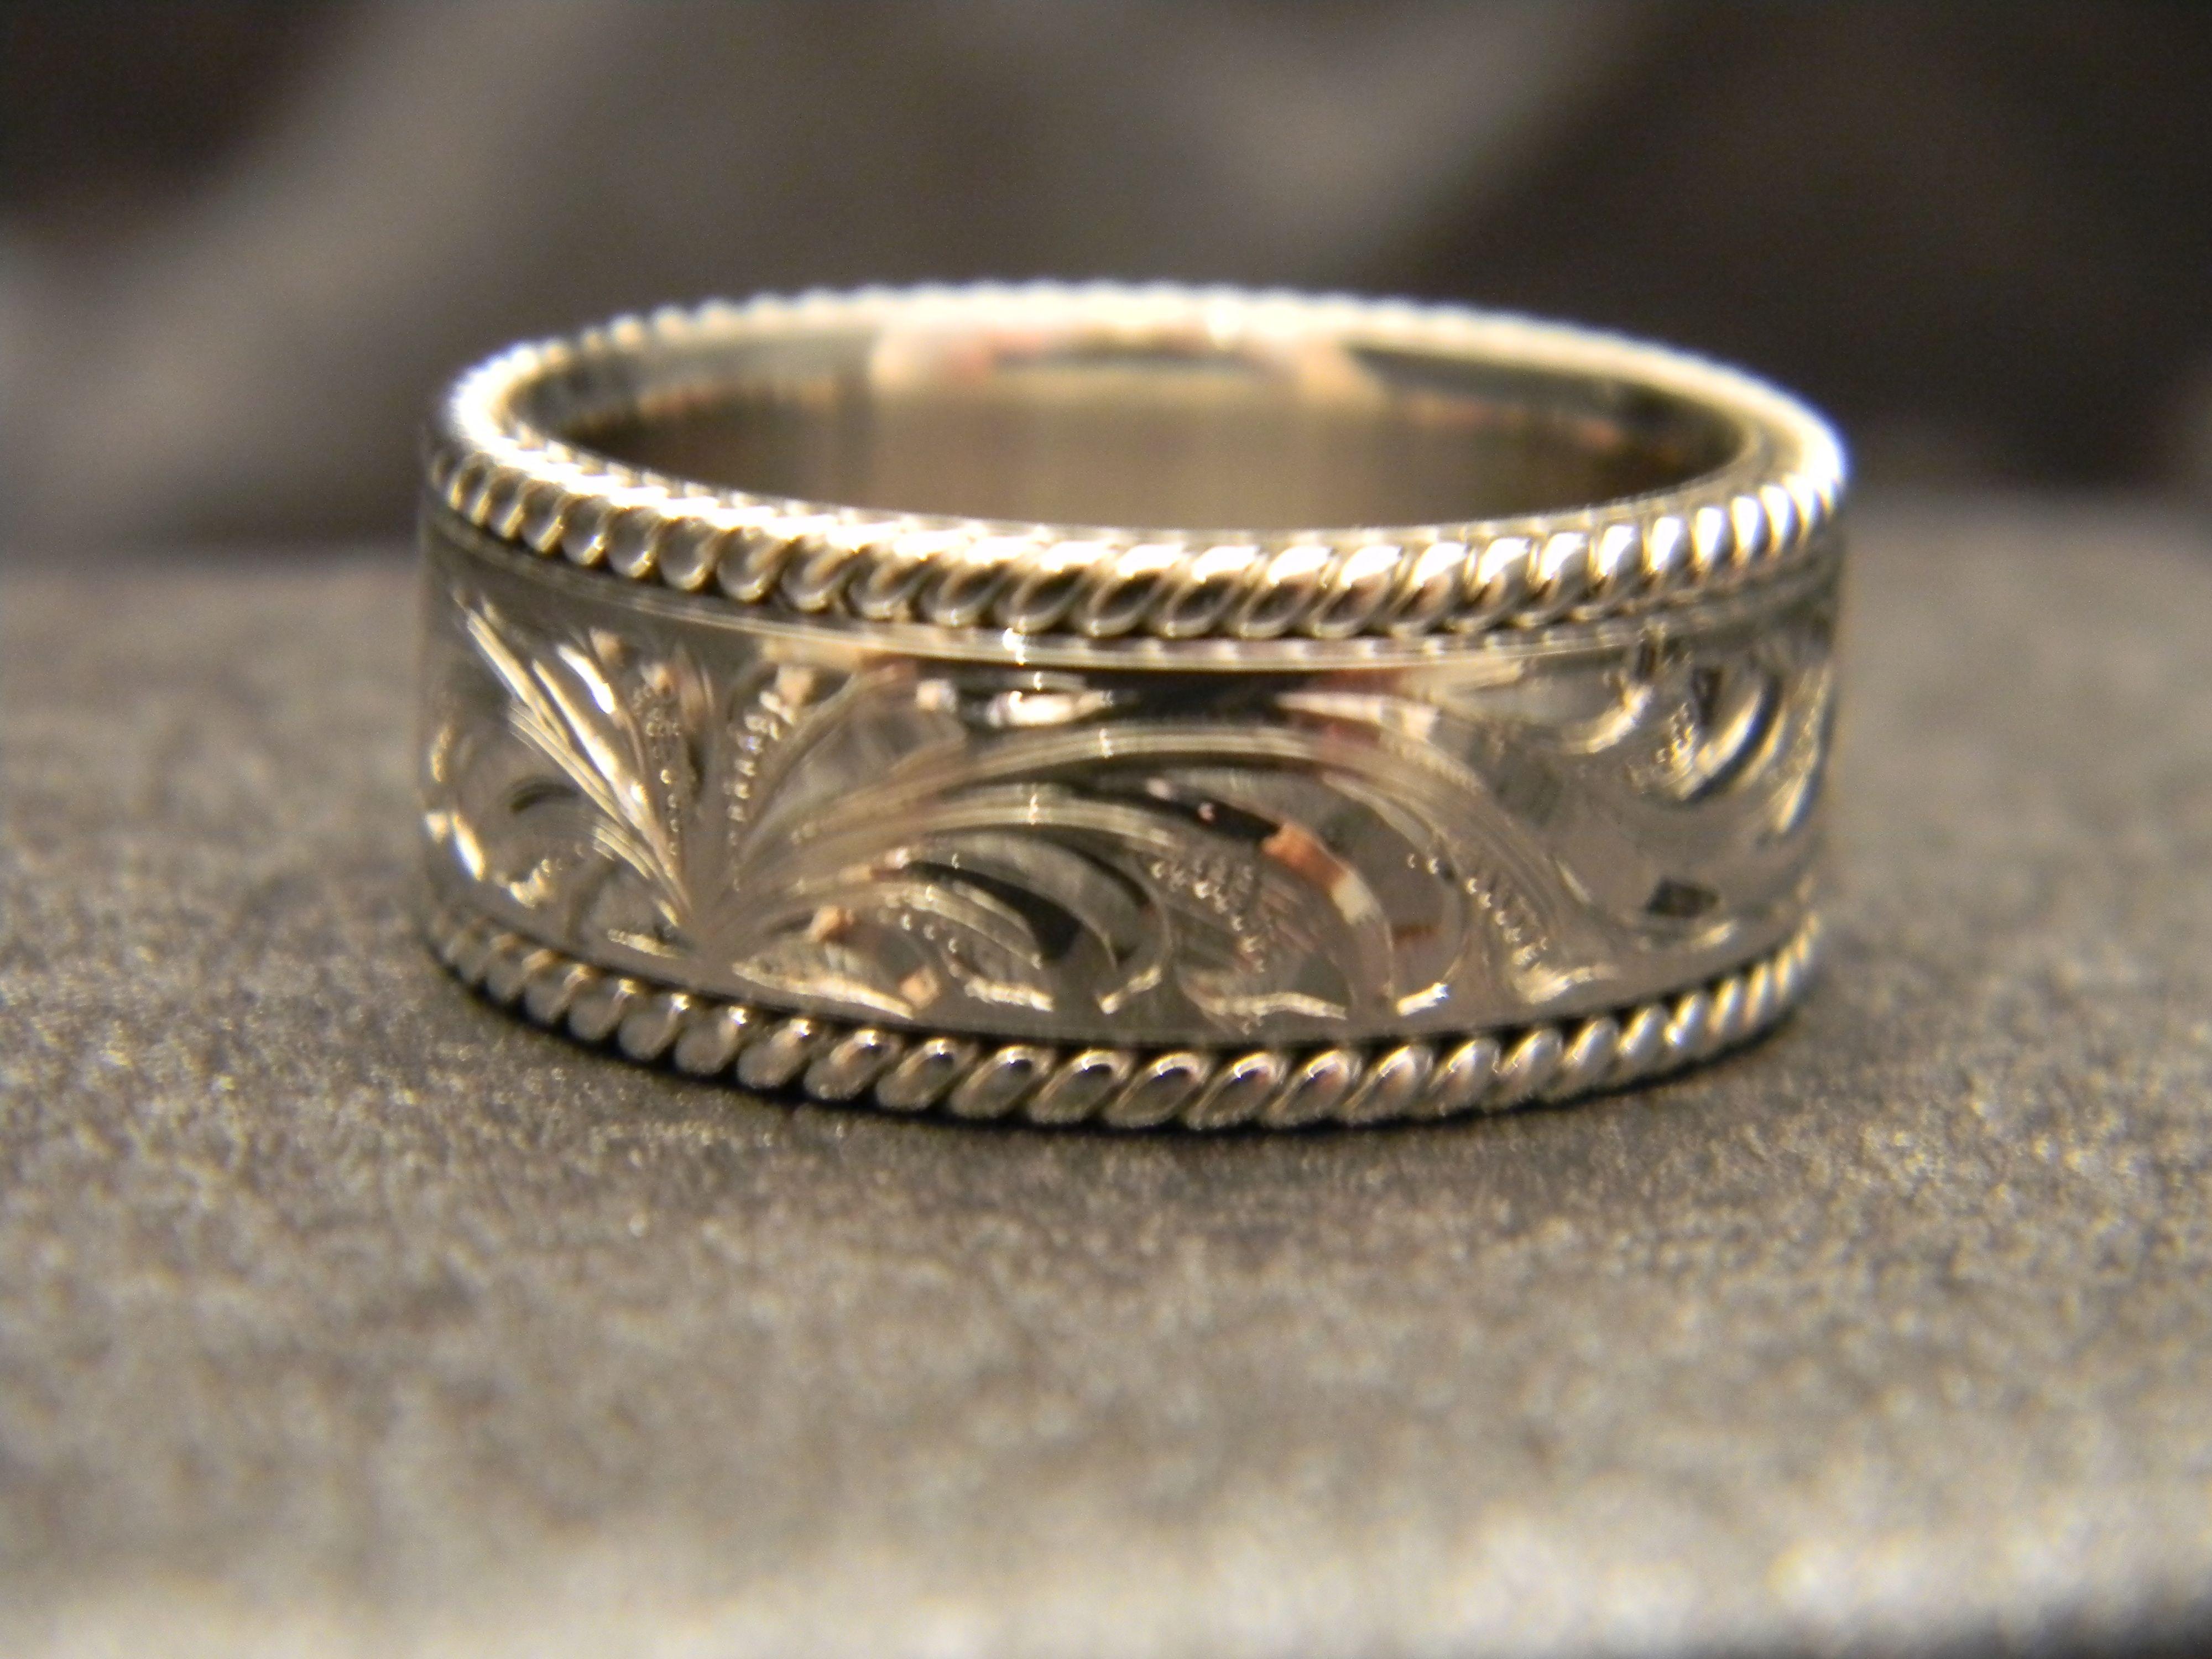 Pin on Custom Engraved Gold Rings